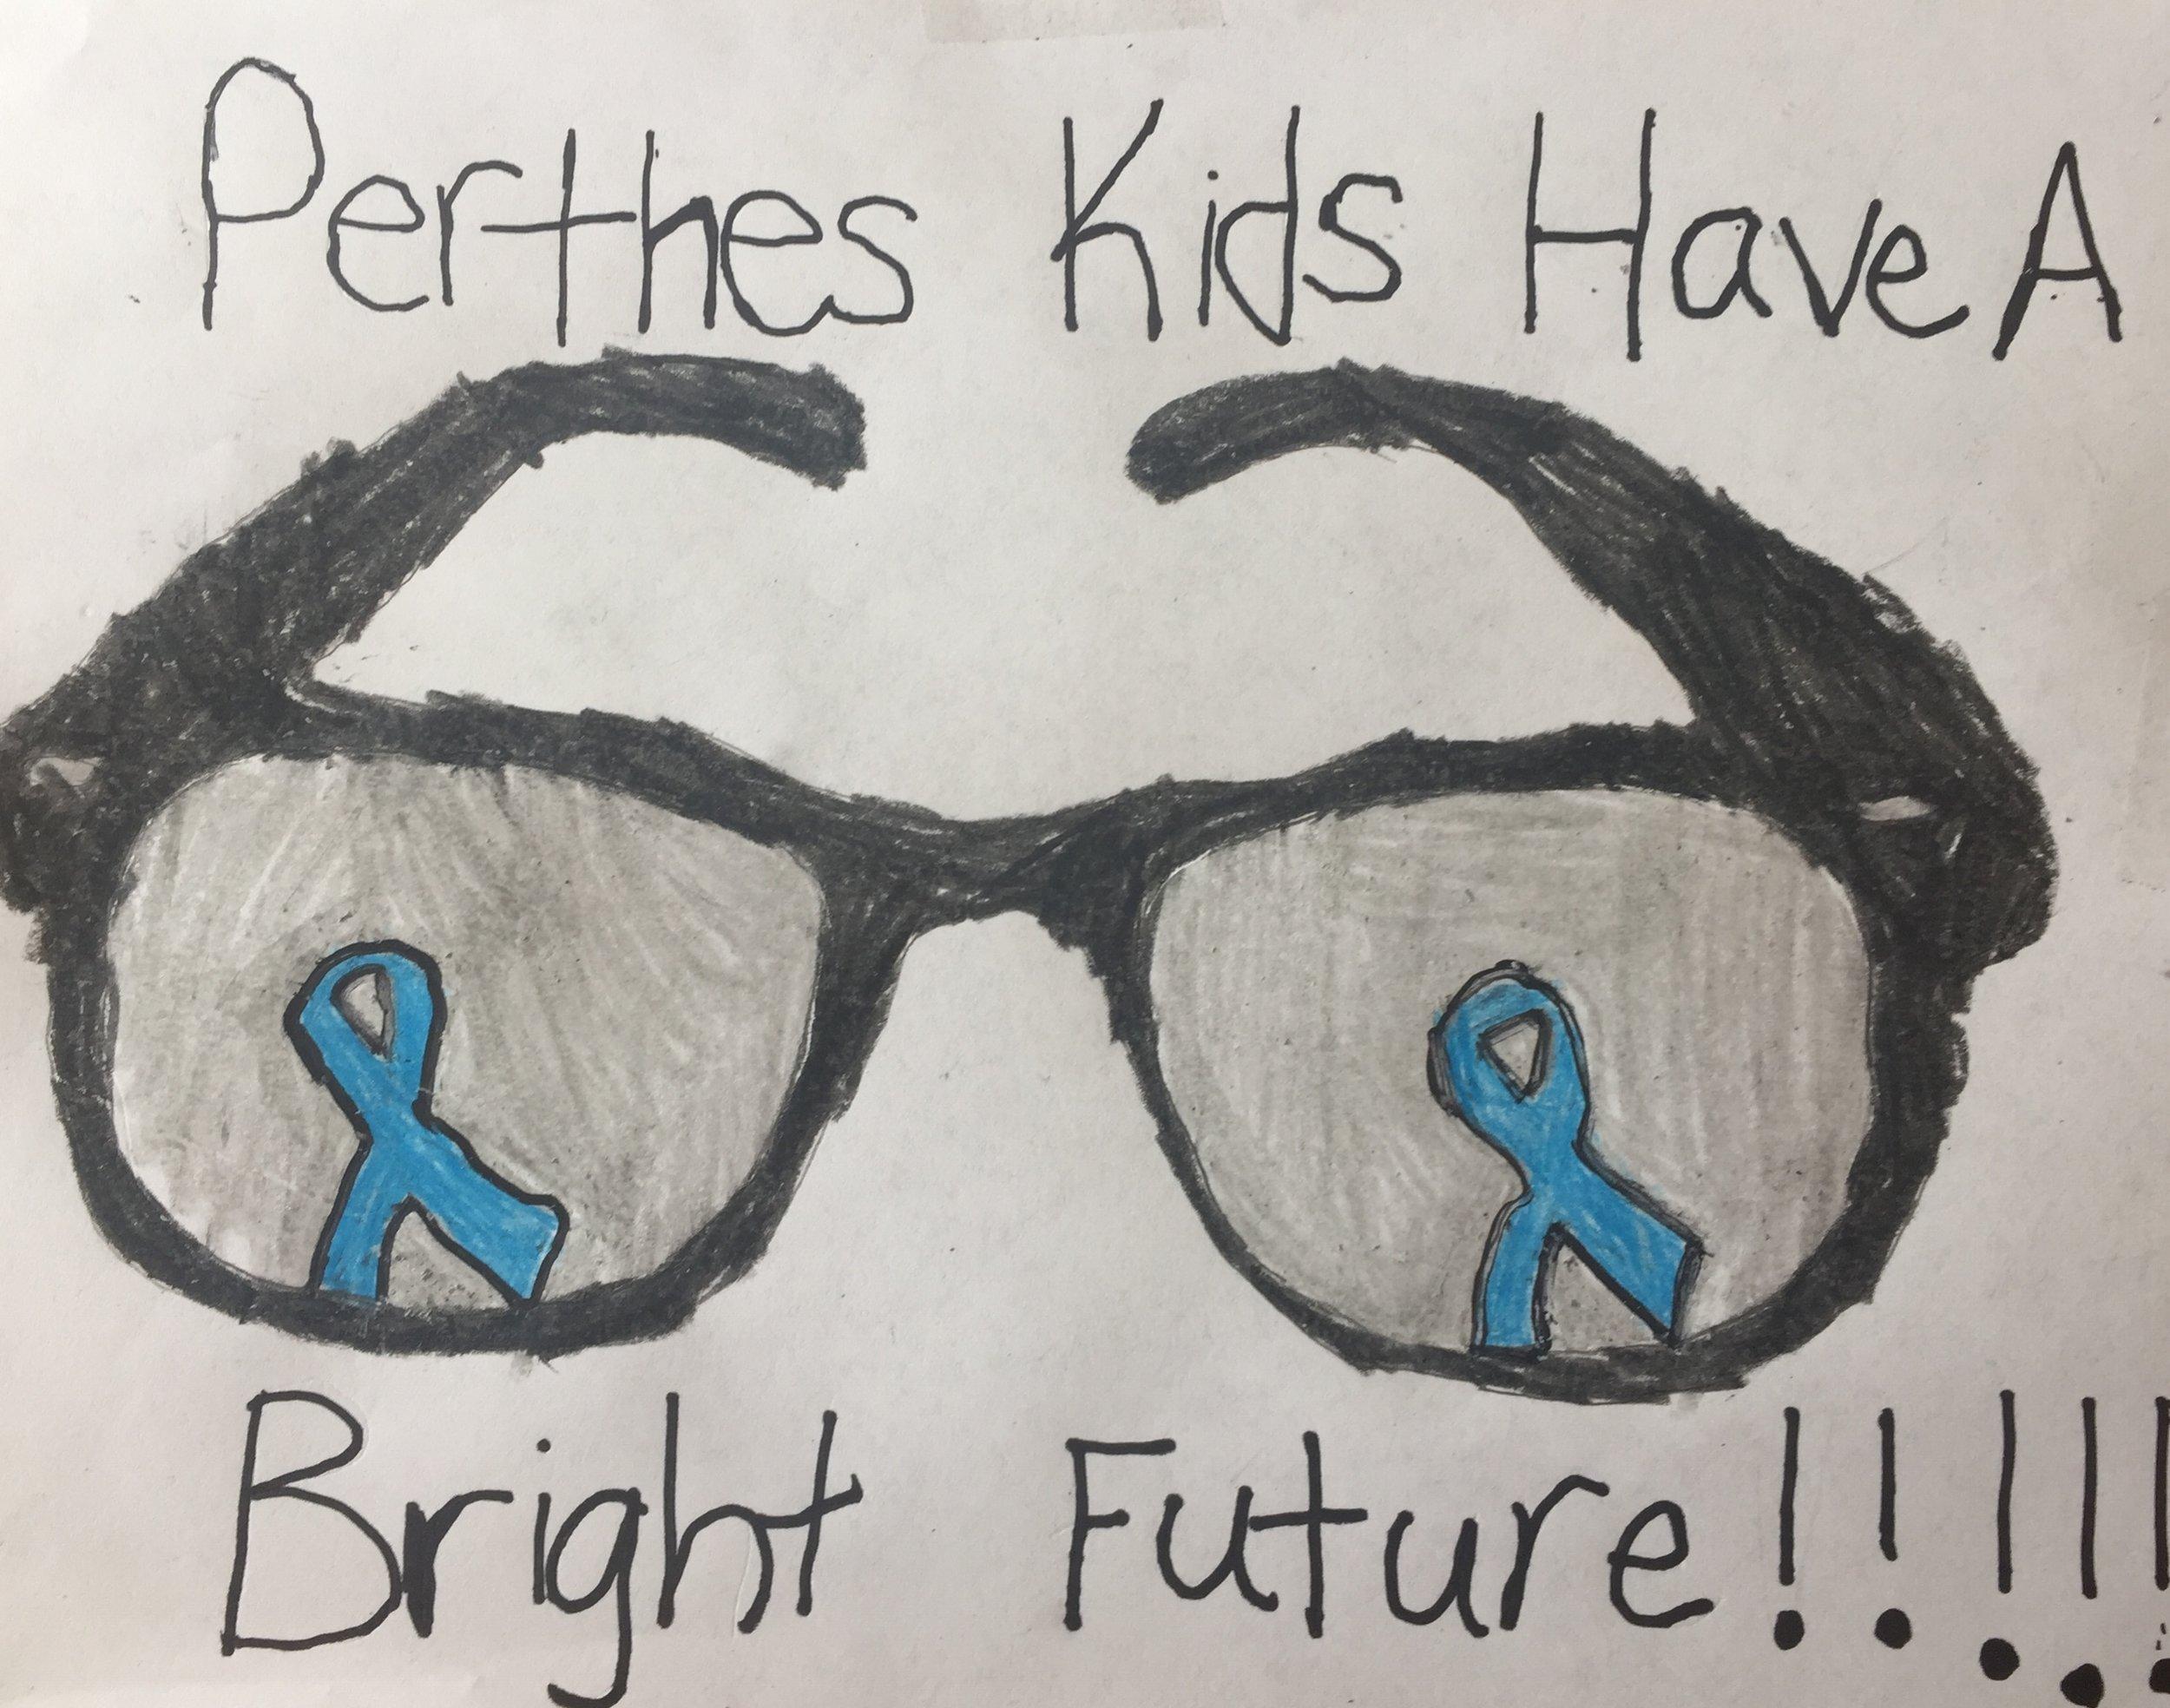 006 - BRIGHT FUTURE by Karter Scheele (age 8) in Havre, Montana, USA